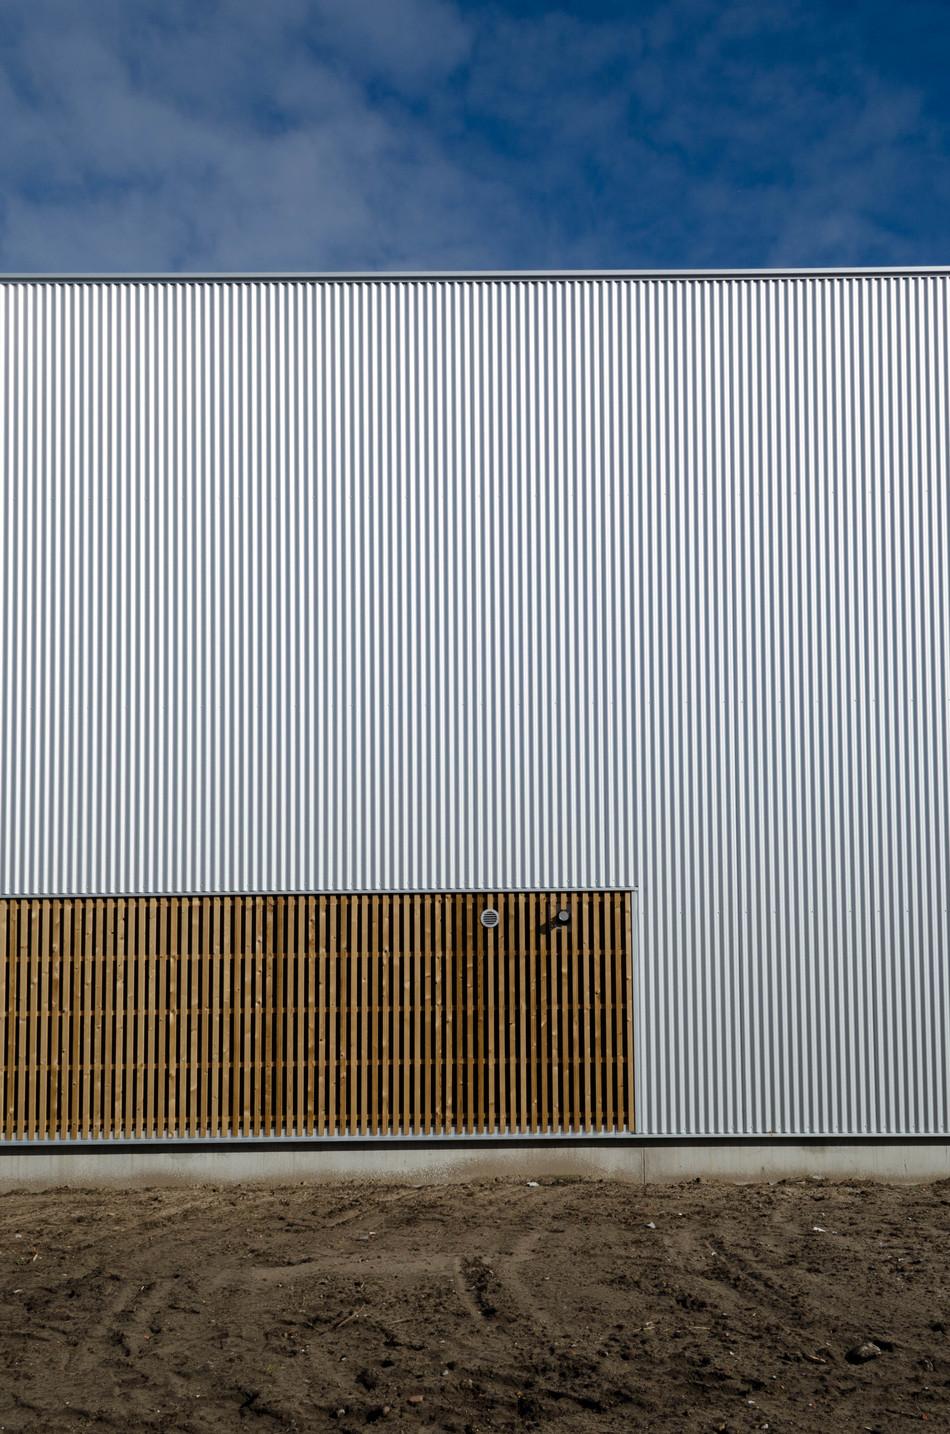 POM, duurzaam ondernemercentrum te Maldegem